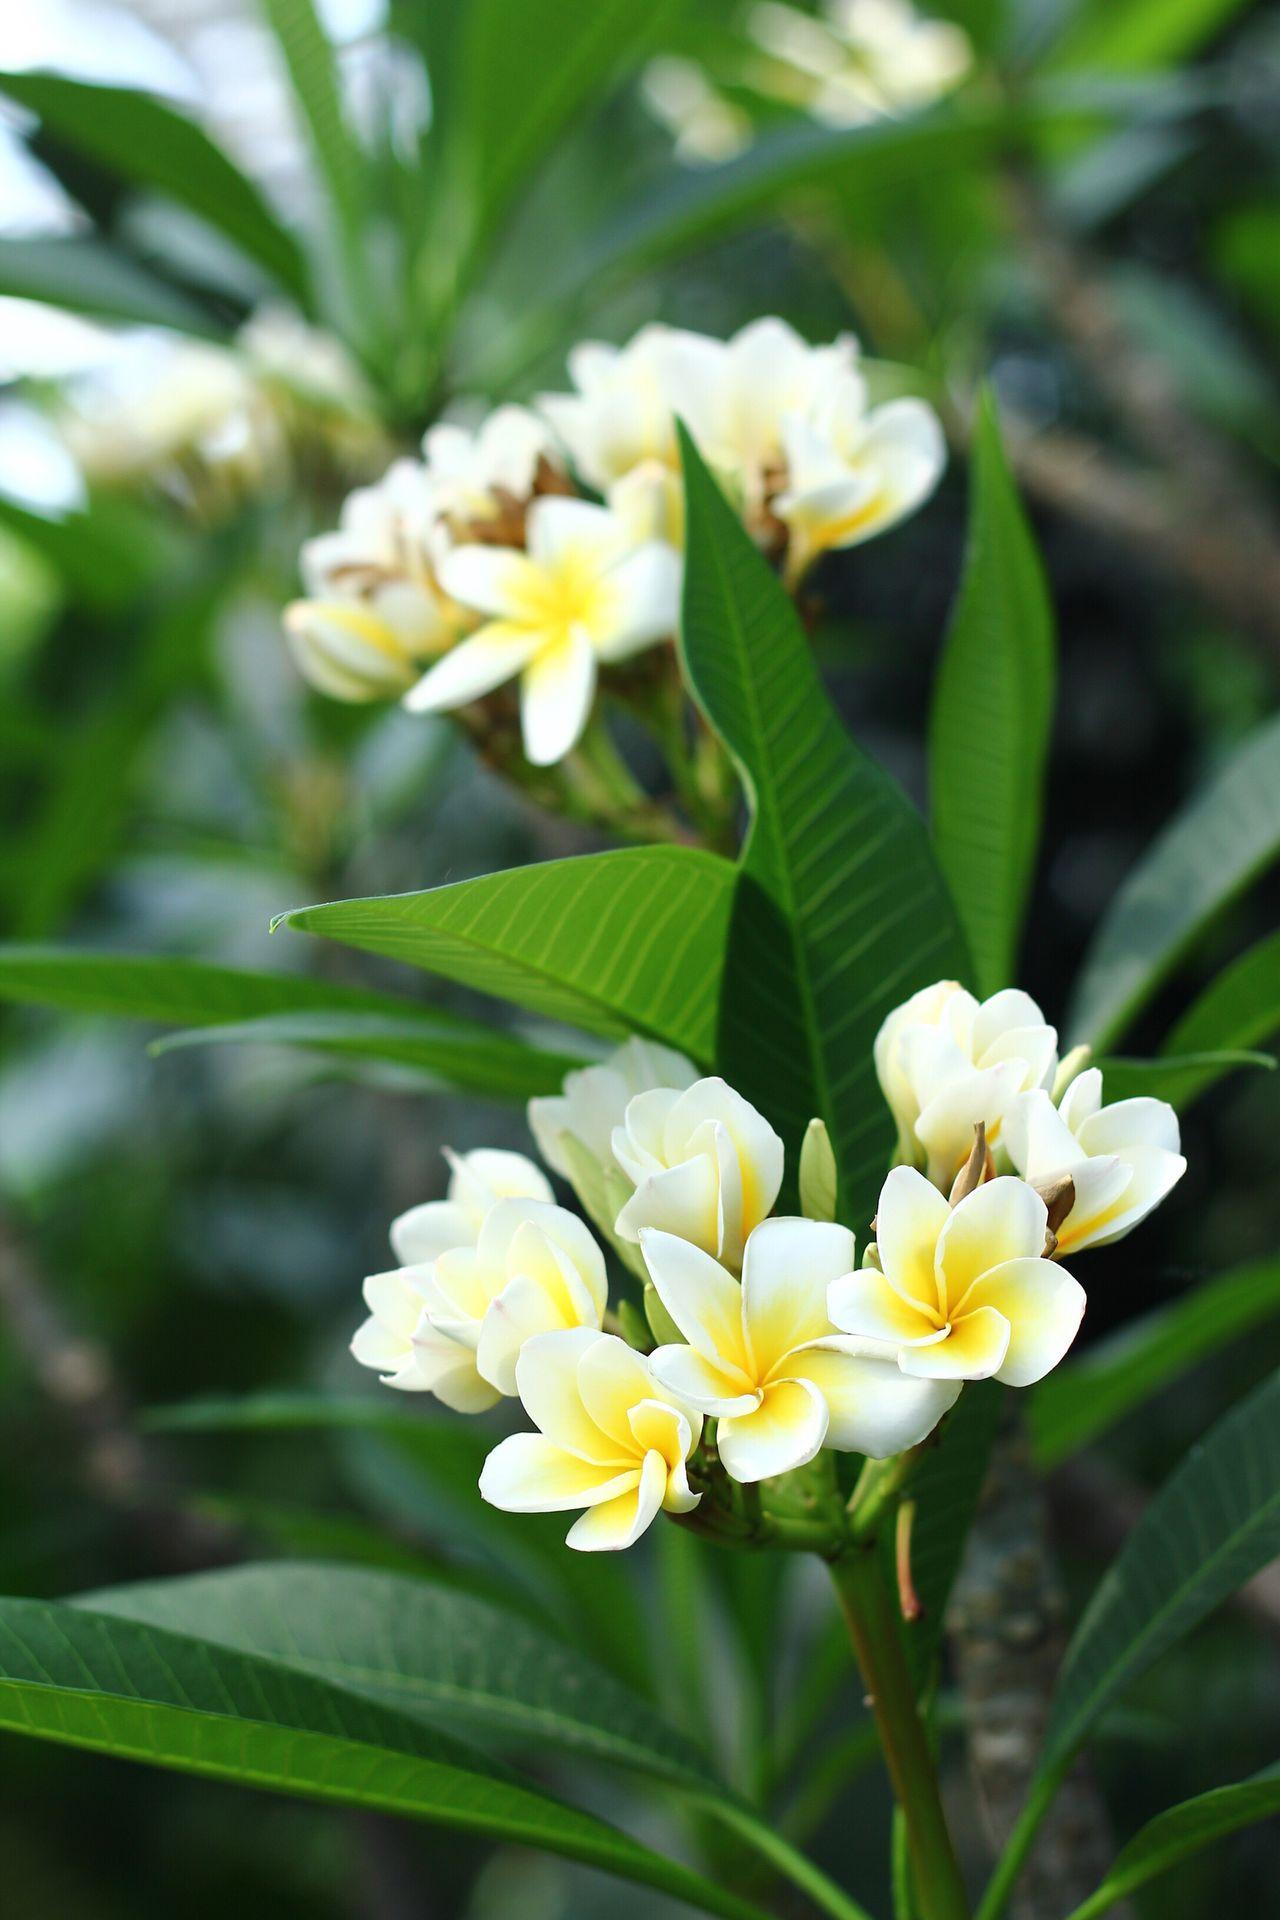 Flower Freshness Beauty In Nature Fragility Flower Head Leaf Growth Yellow Plumeria